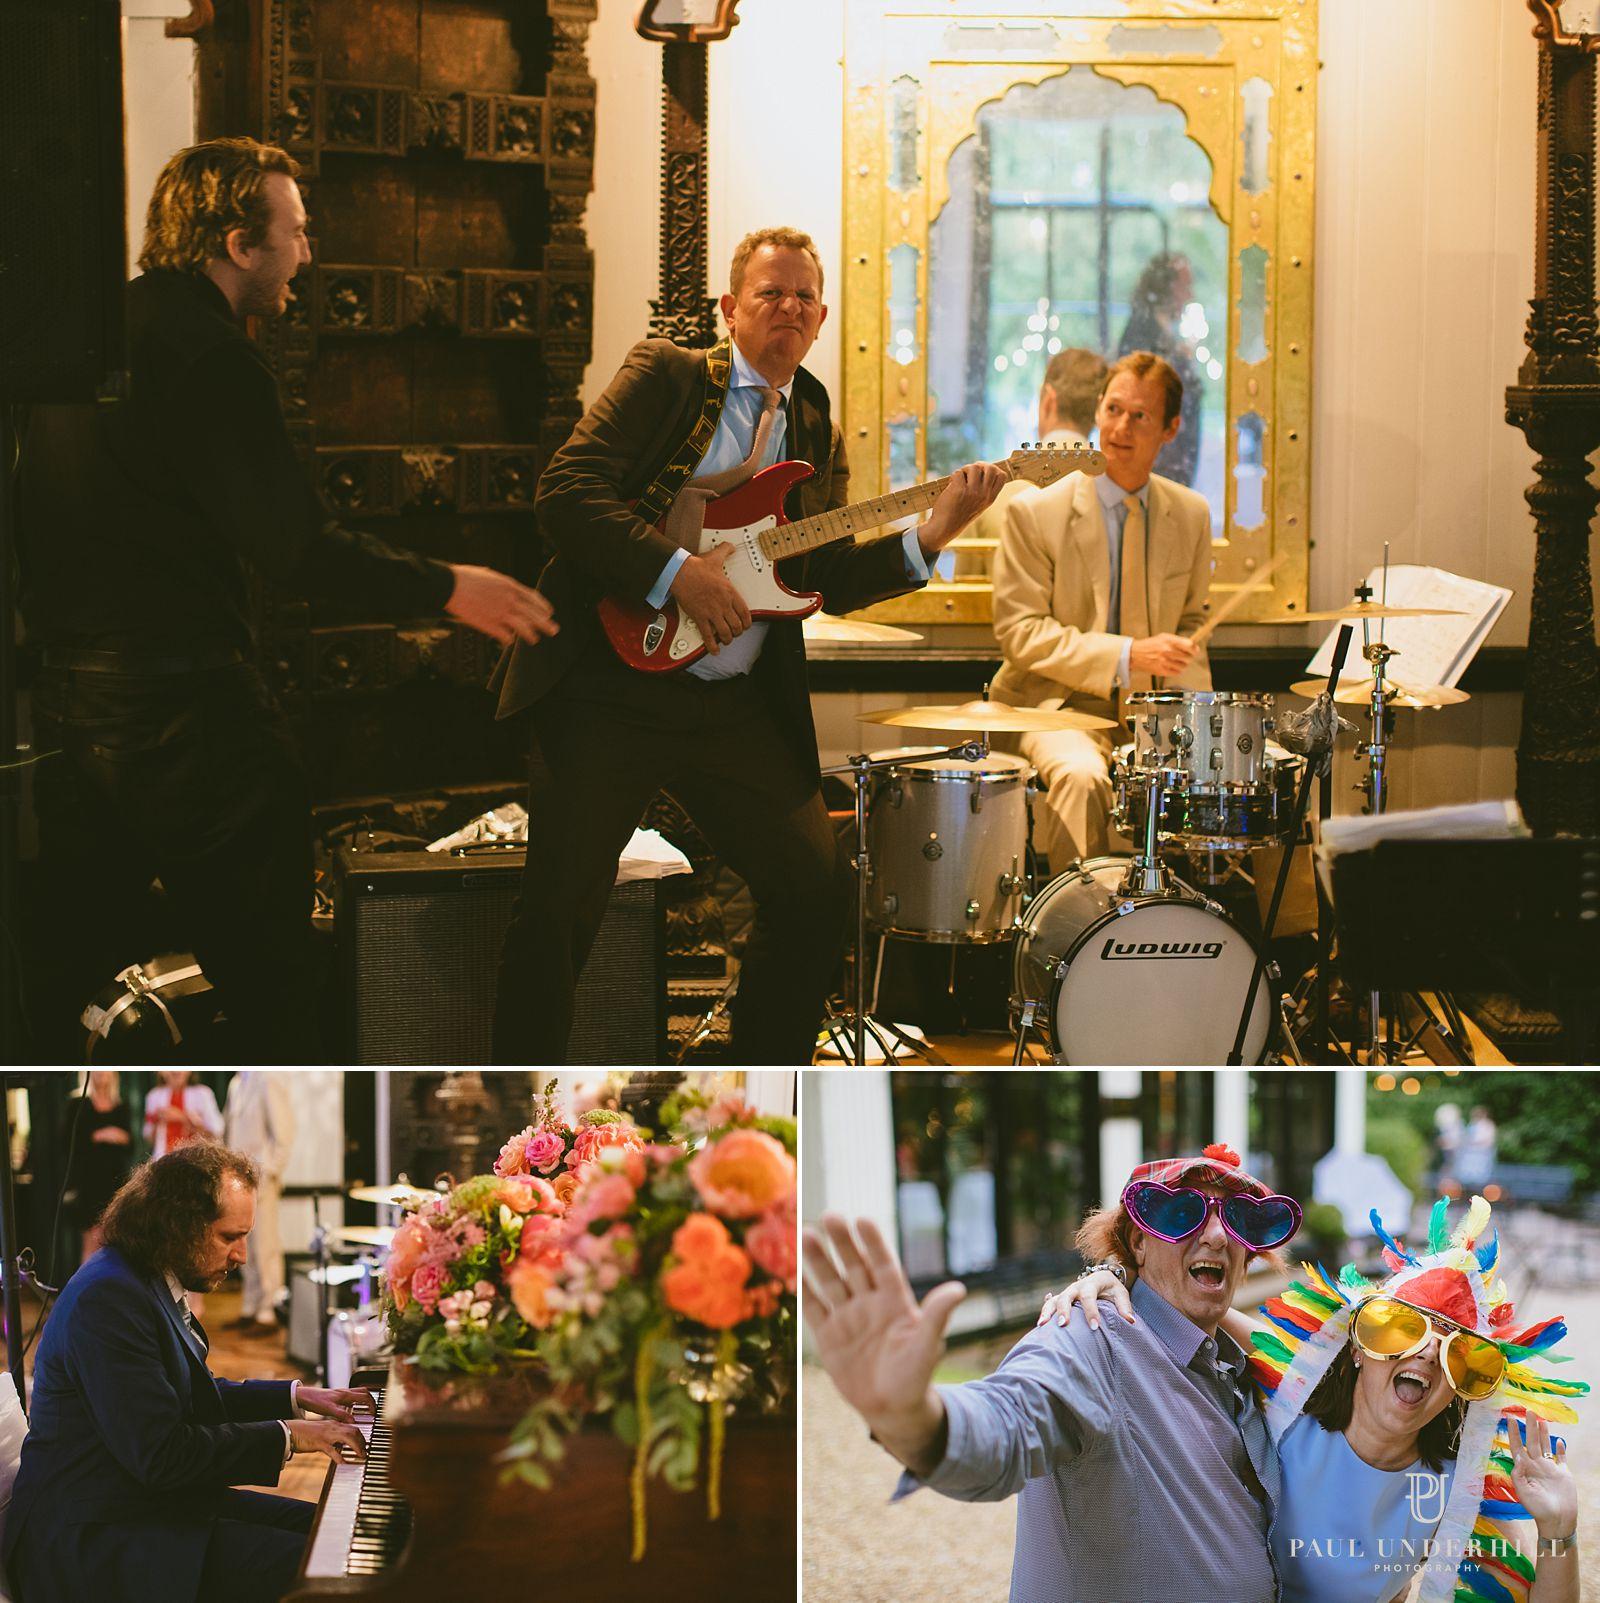 Guests having fun at Larmer Tree wedding